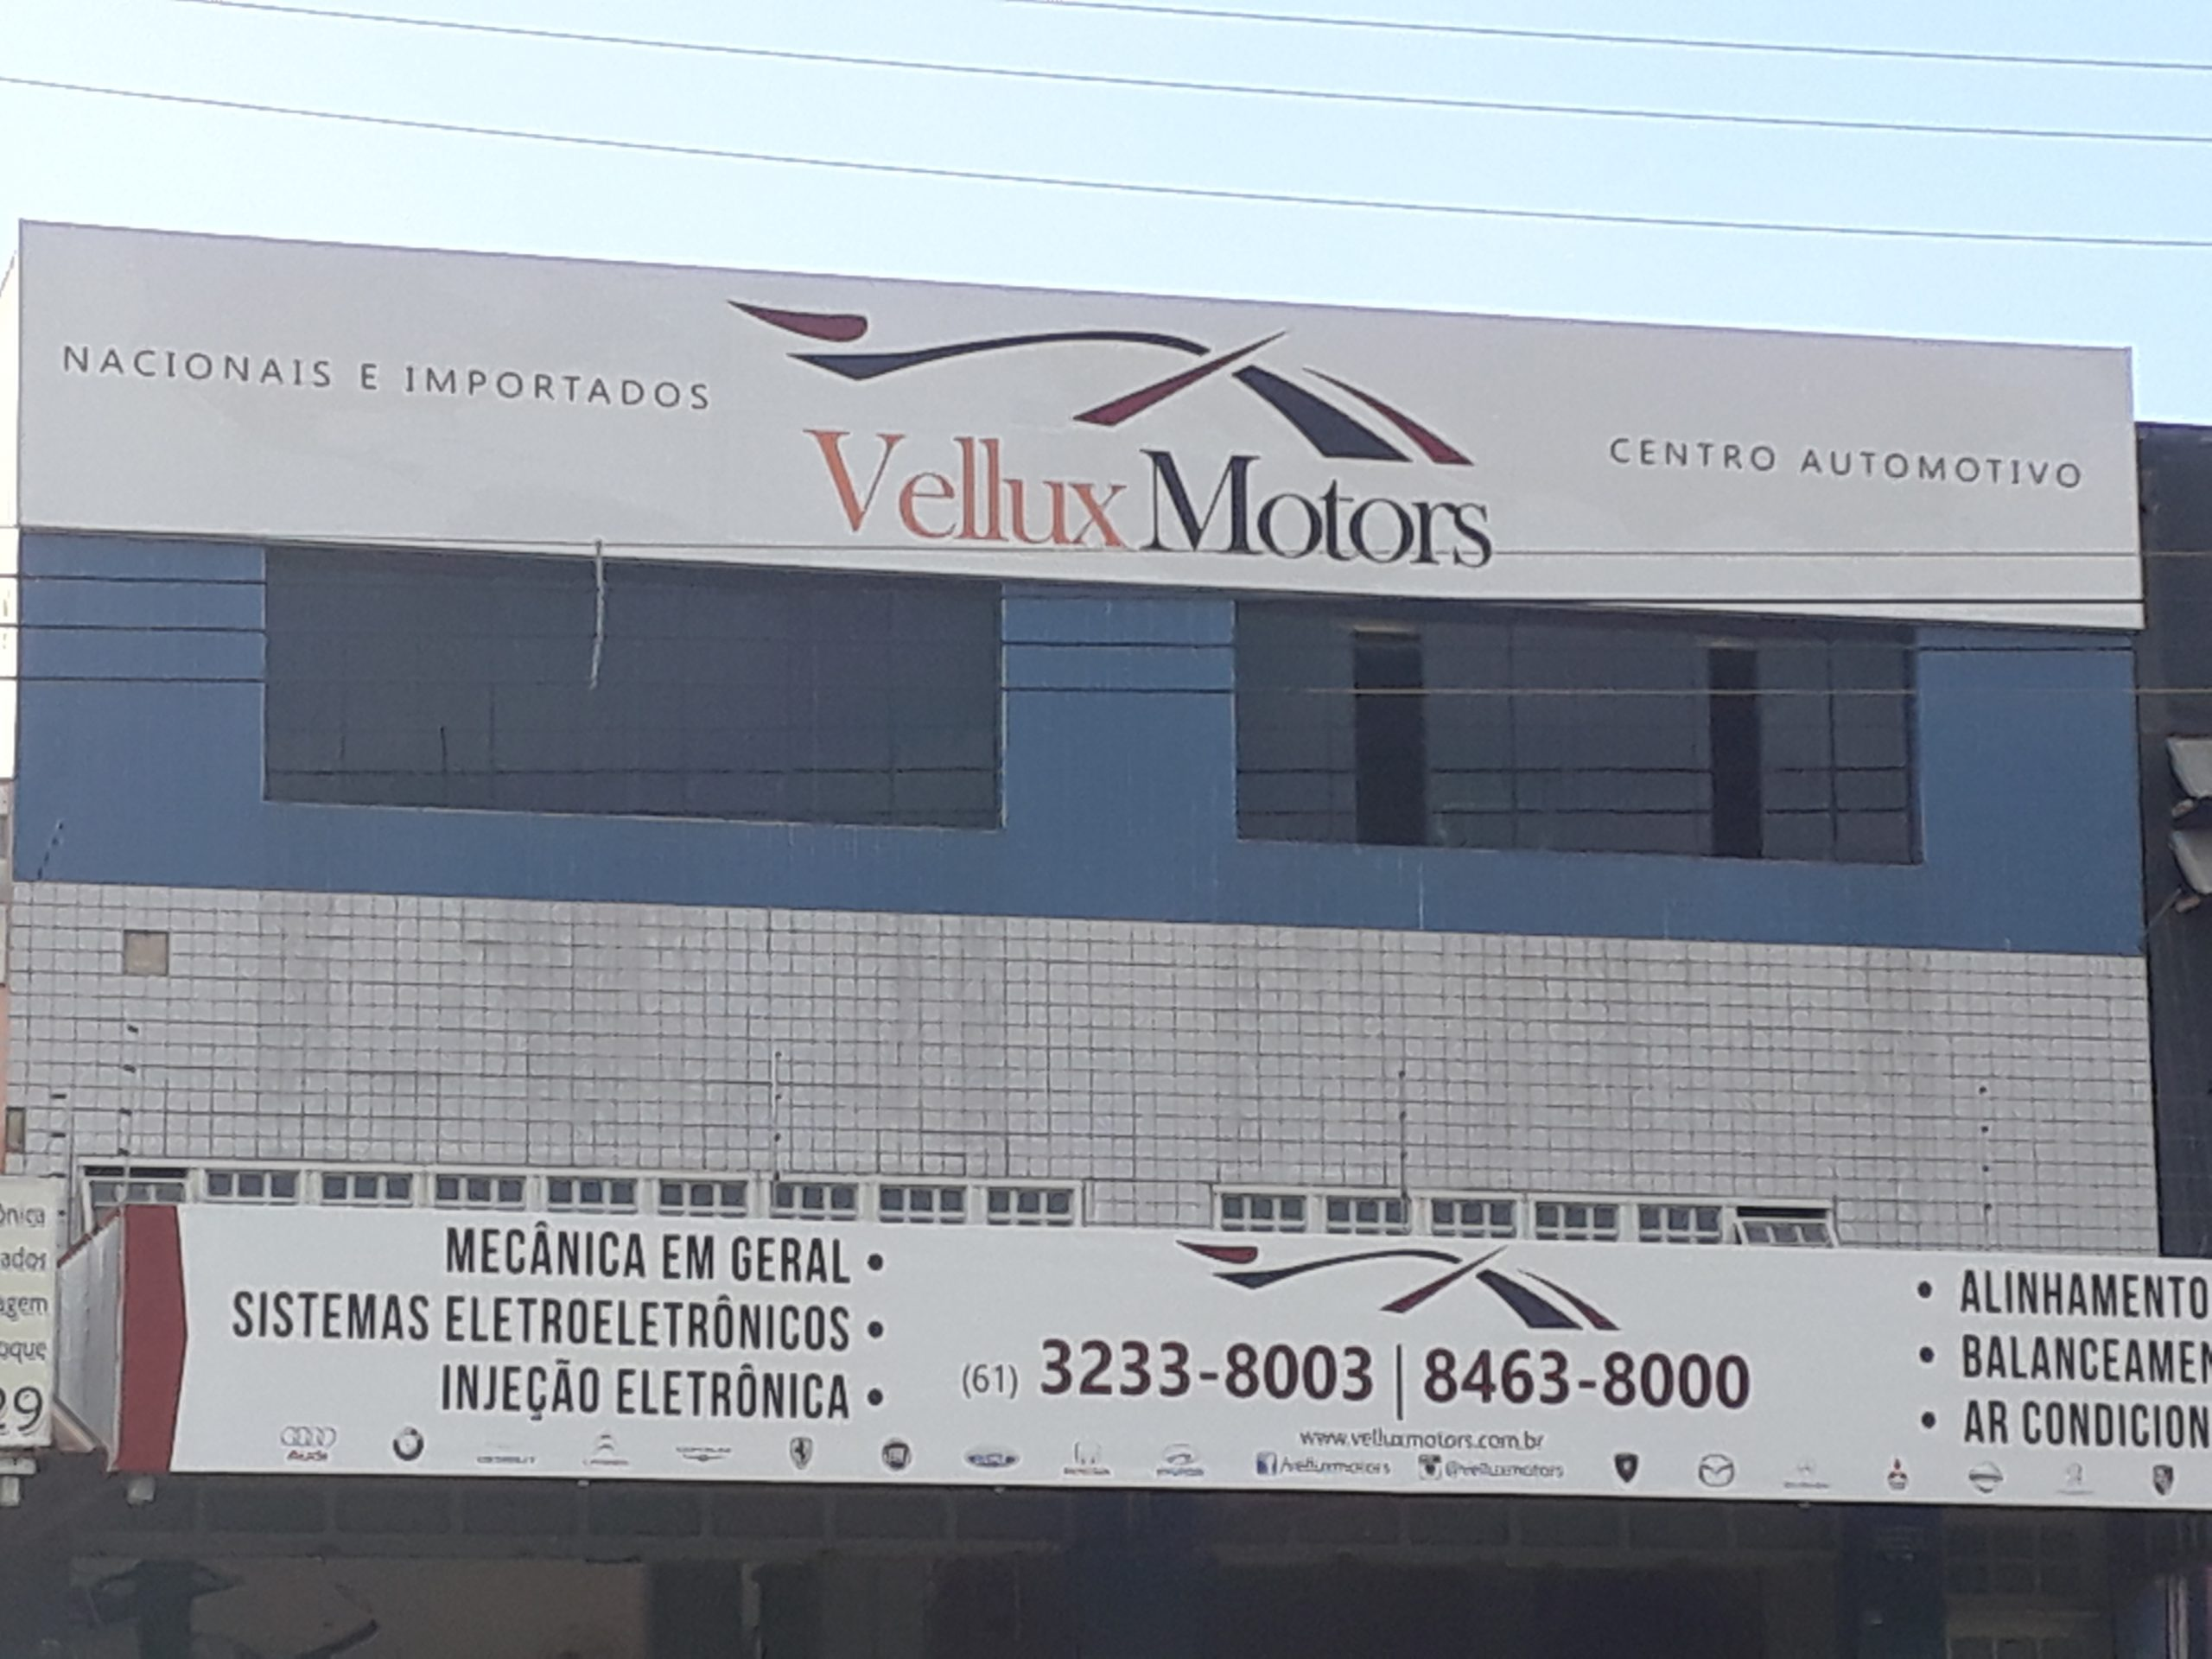 Photo of VELLUX MOTORS, CENTRO AUTOMOTIVO, SOF NORTE